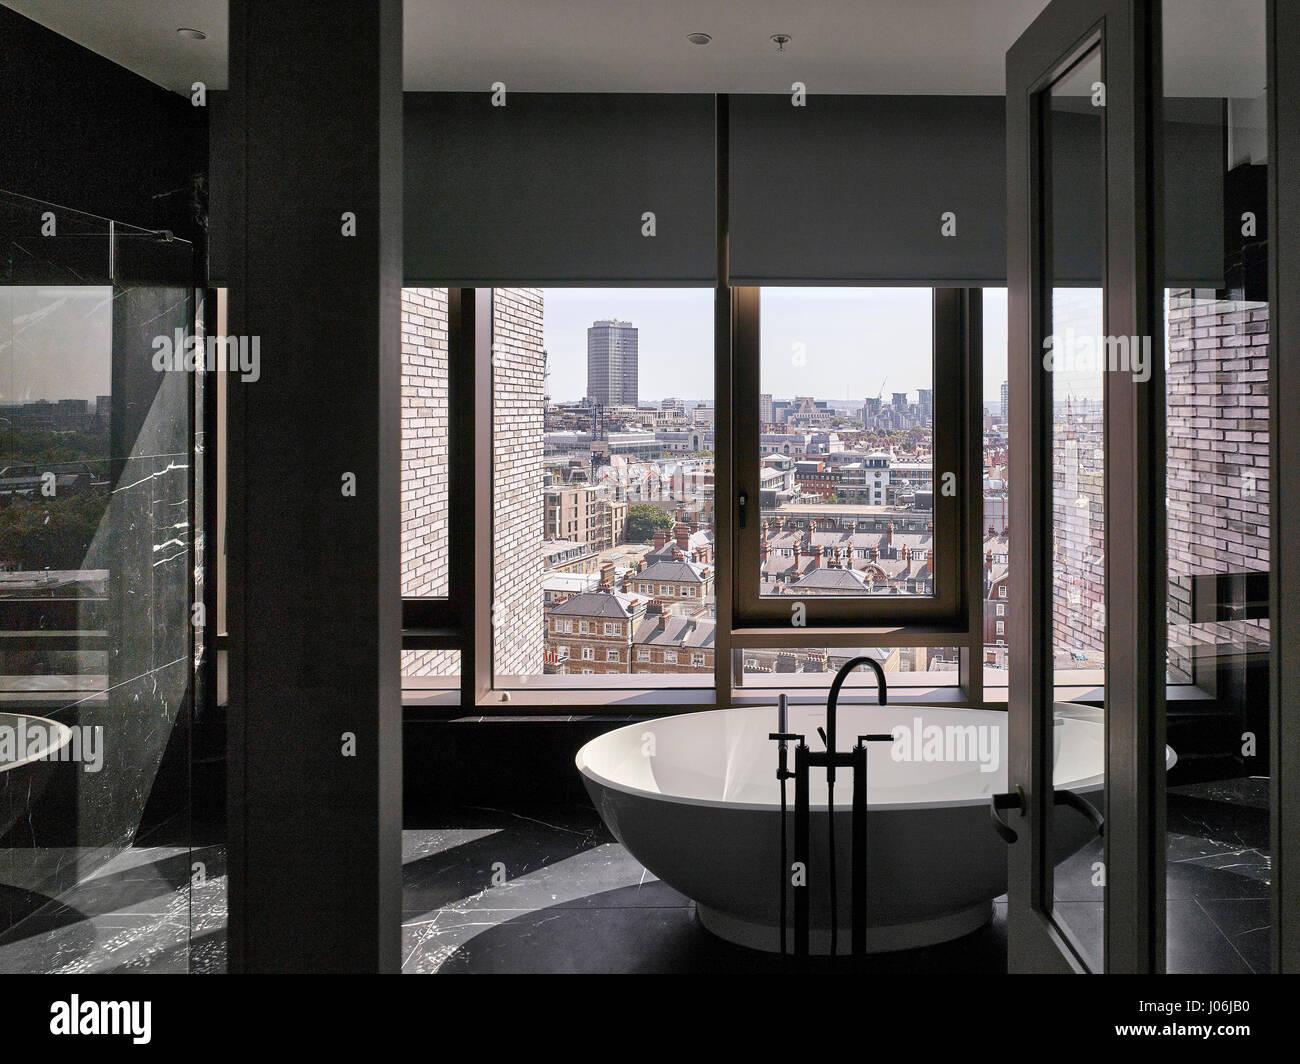 Bathroom and cityscape. 55 Victoria Street, London, United Kingdom. Architect: Stiff + Trevillion Architects, 2016. - Stock Image